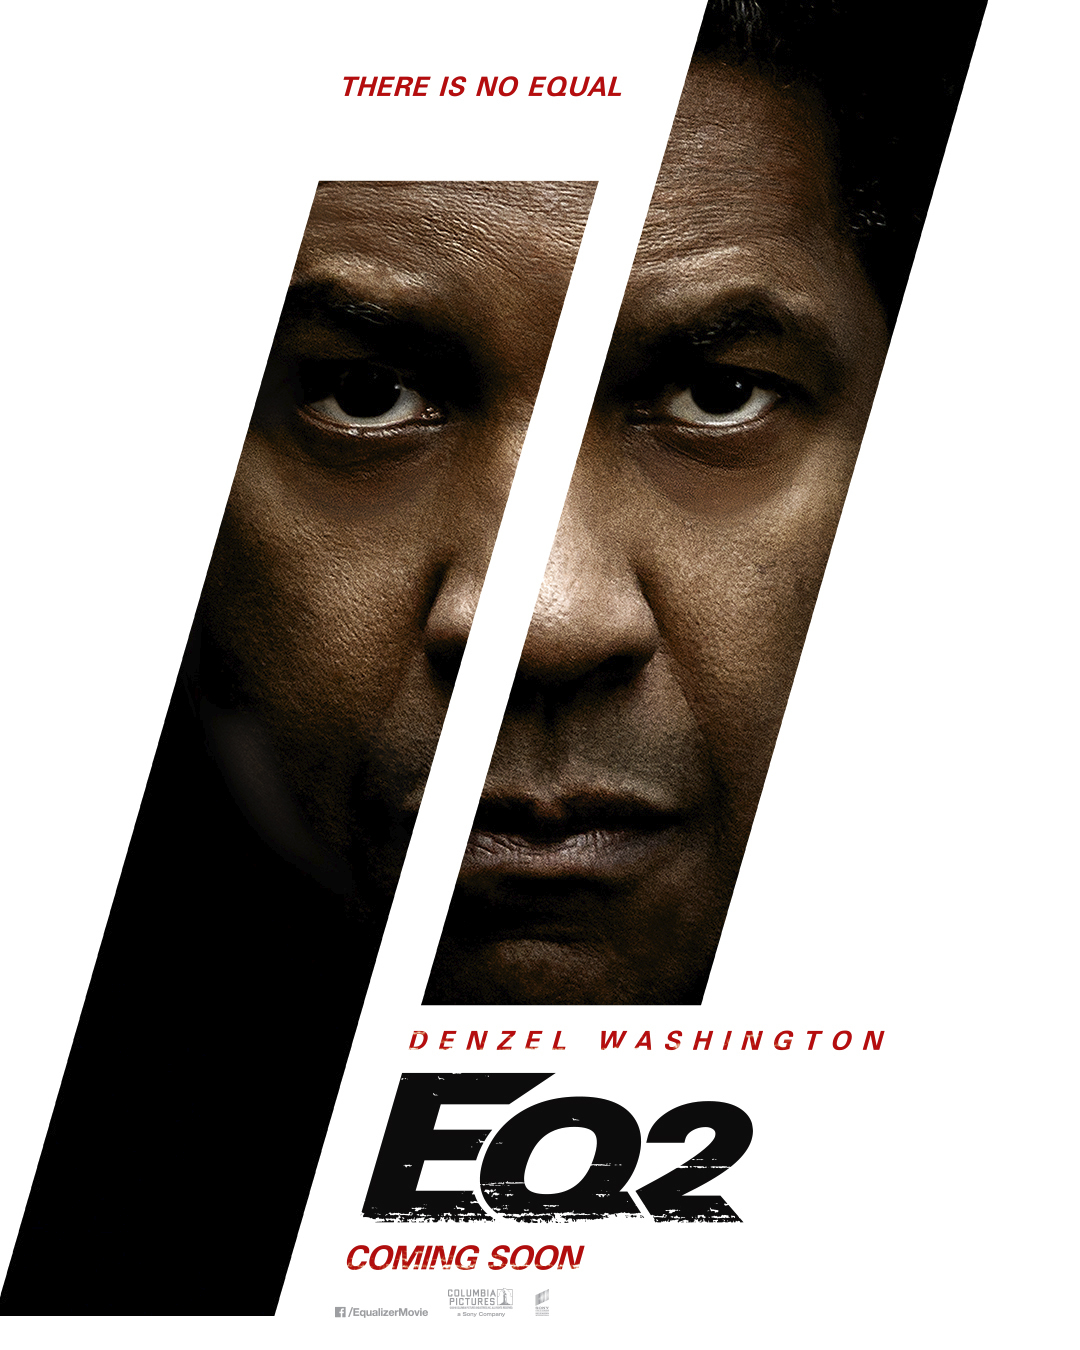 The Equalizer 2 Official Movie poster starring Denzel Washington